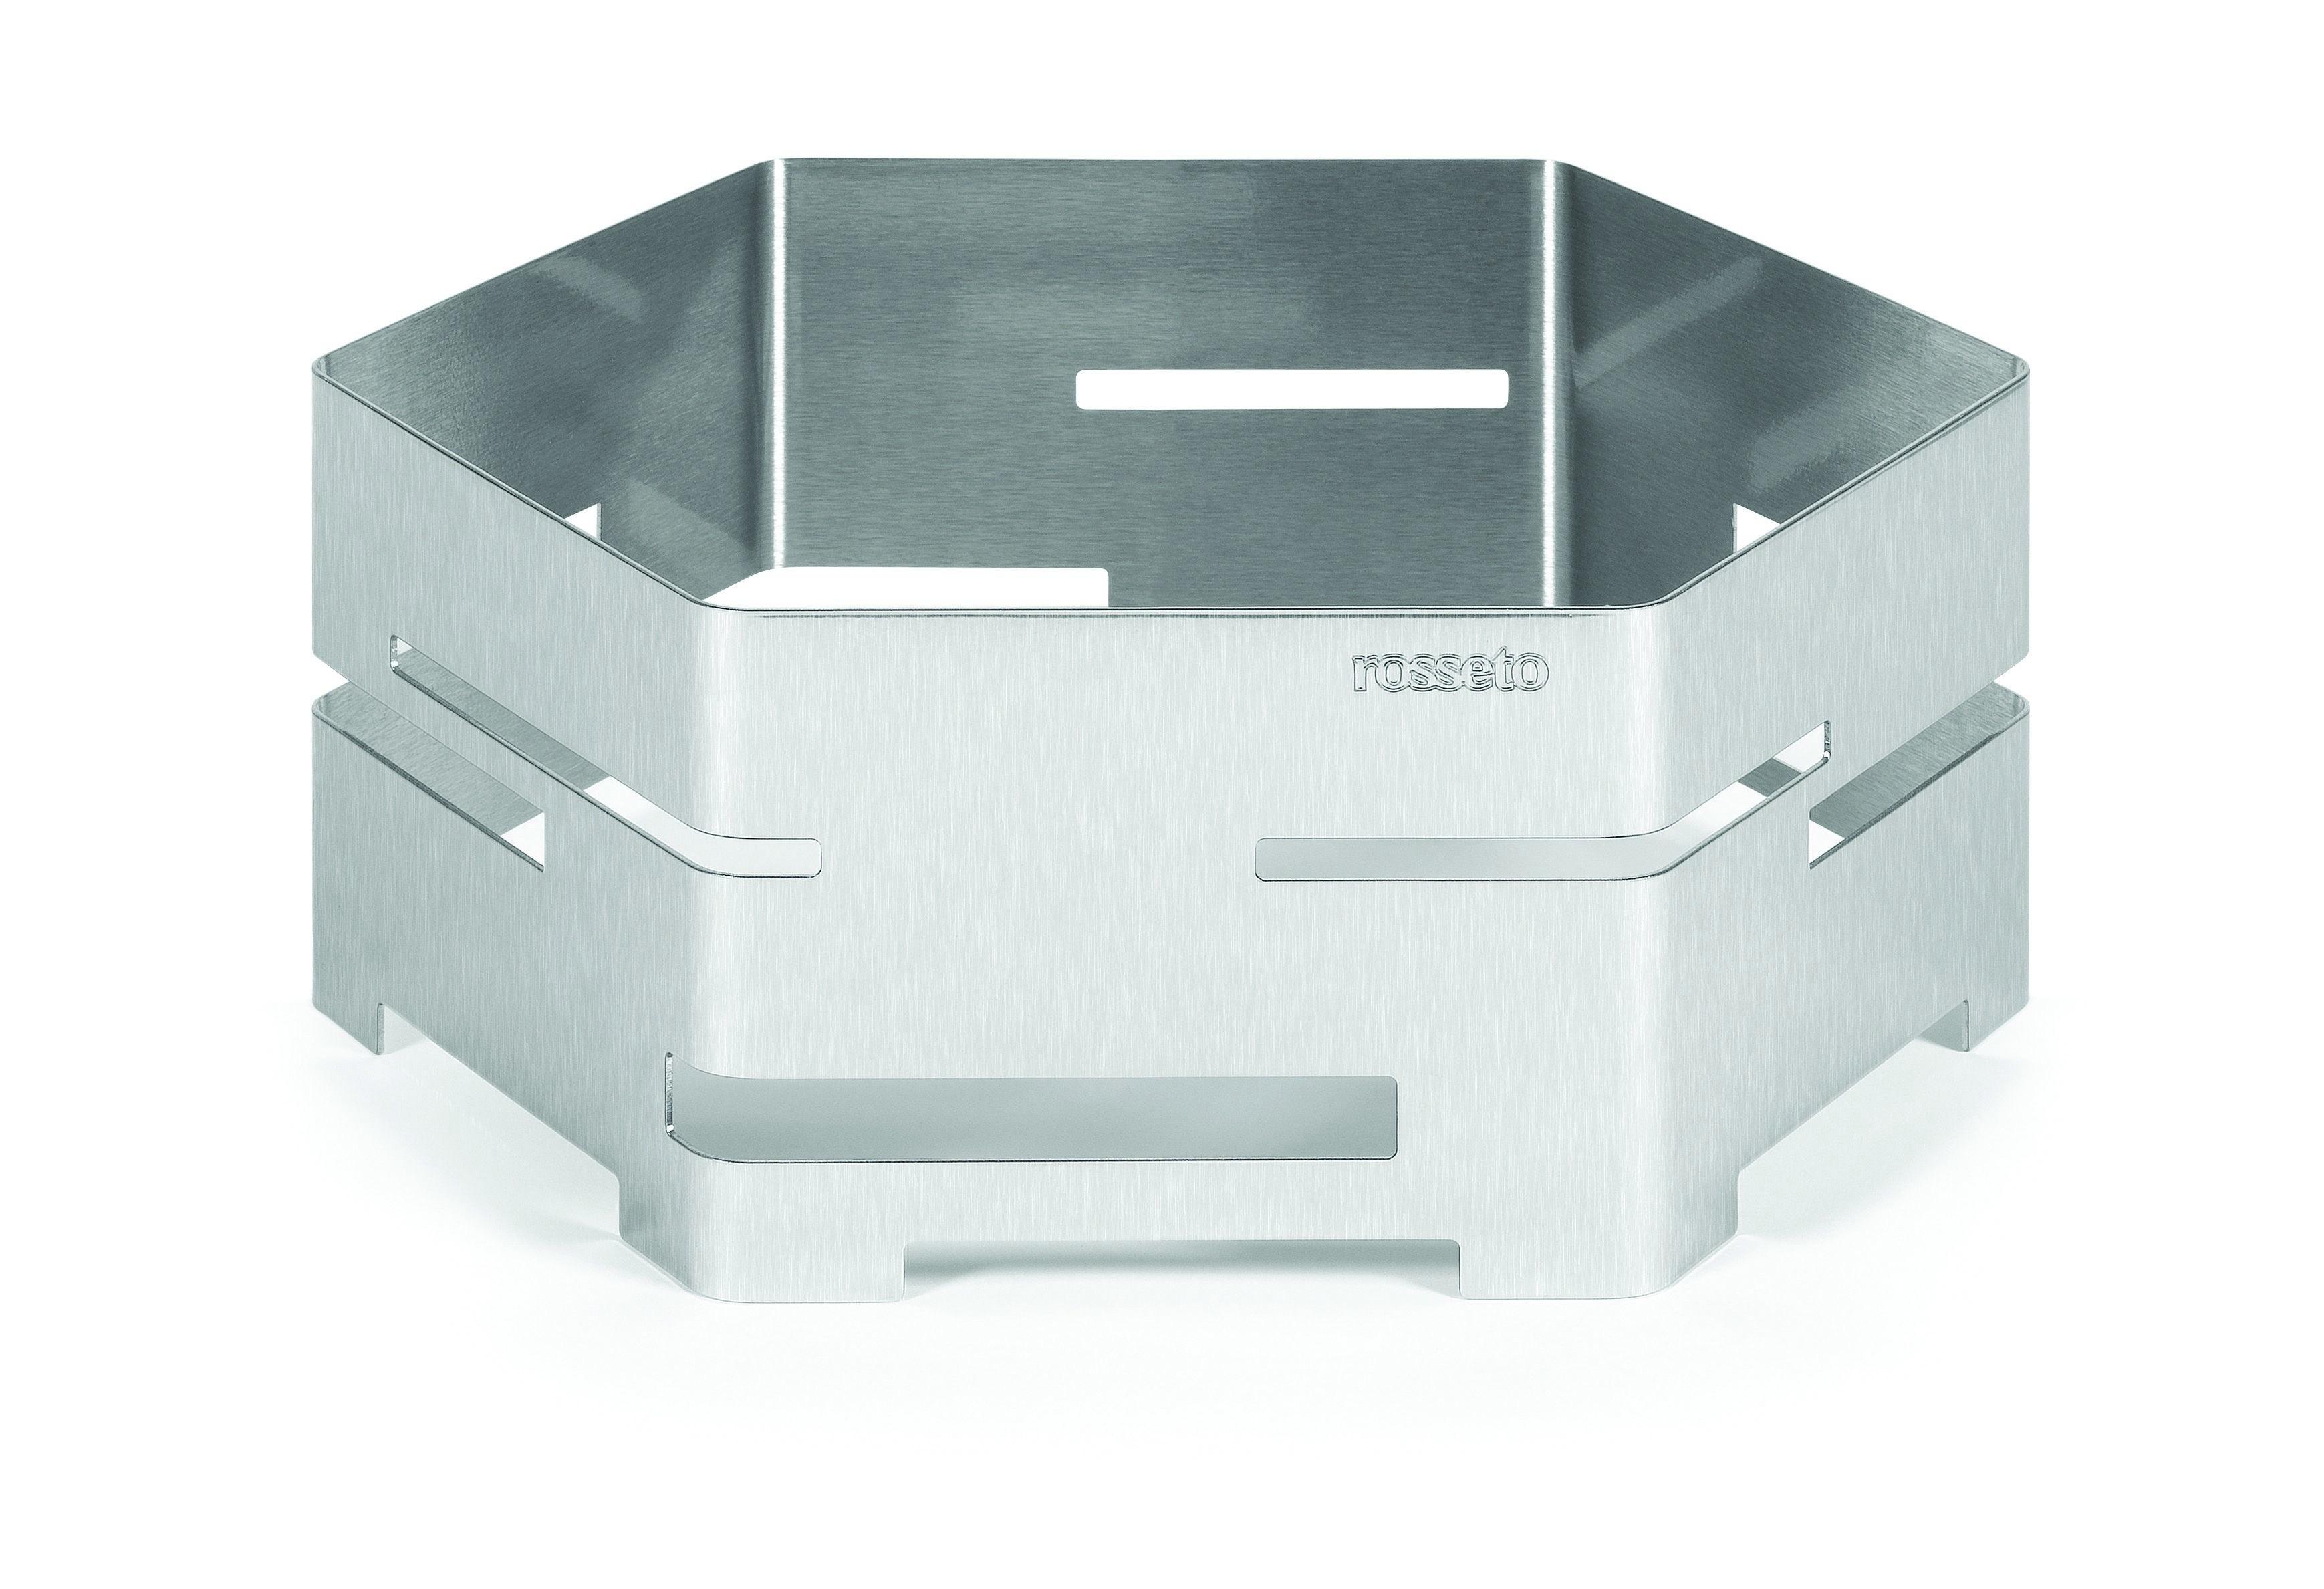 "Rosseto SM117 Medium Brushed Stainless Steel Hexagon Riser- 16"" x 16"" x 6""H"